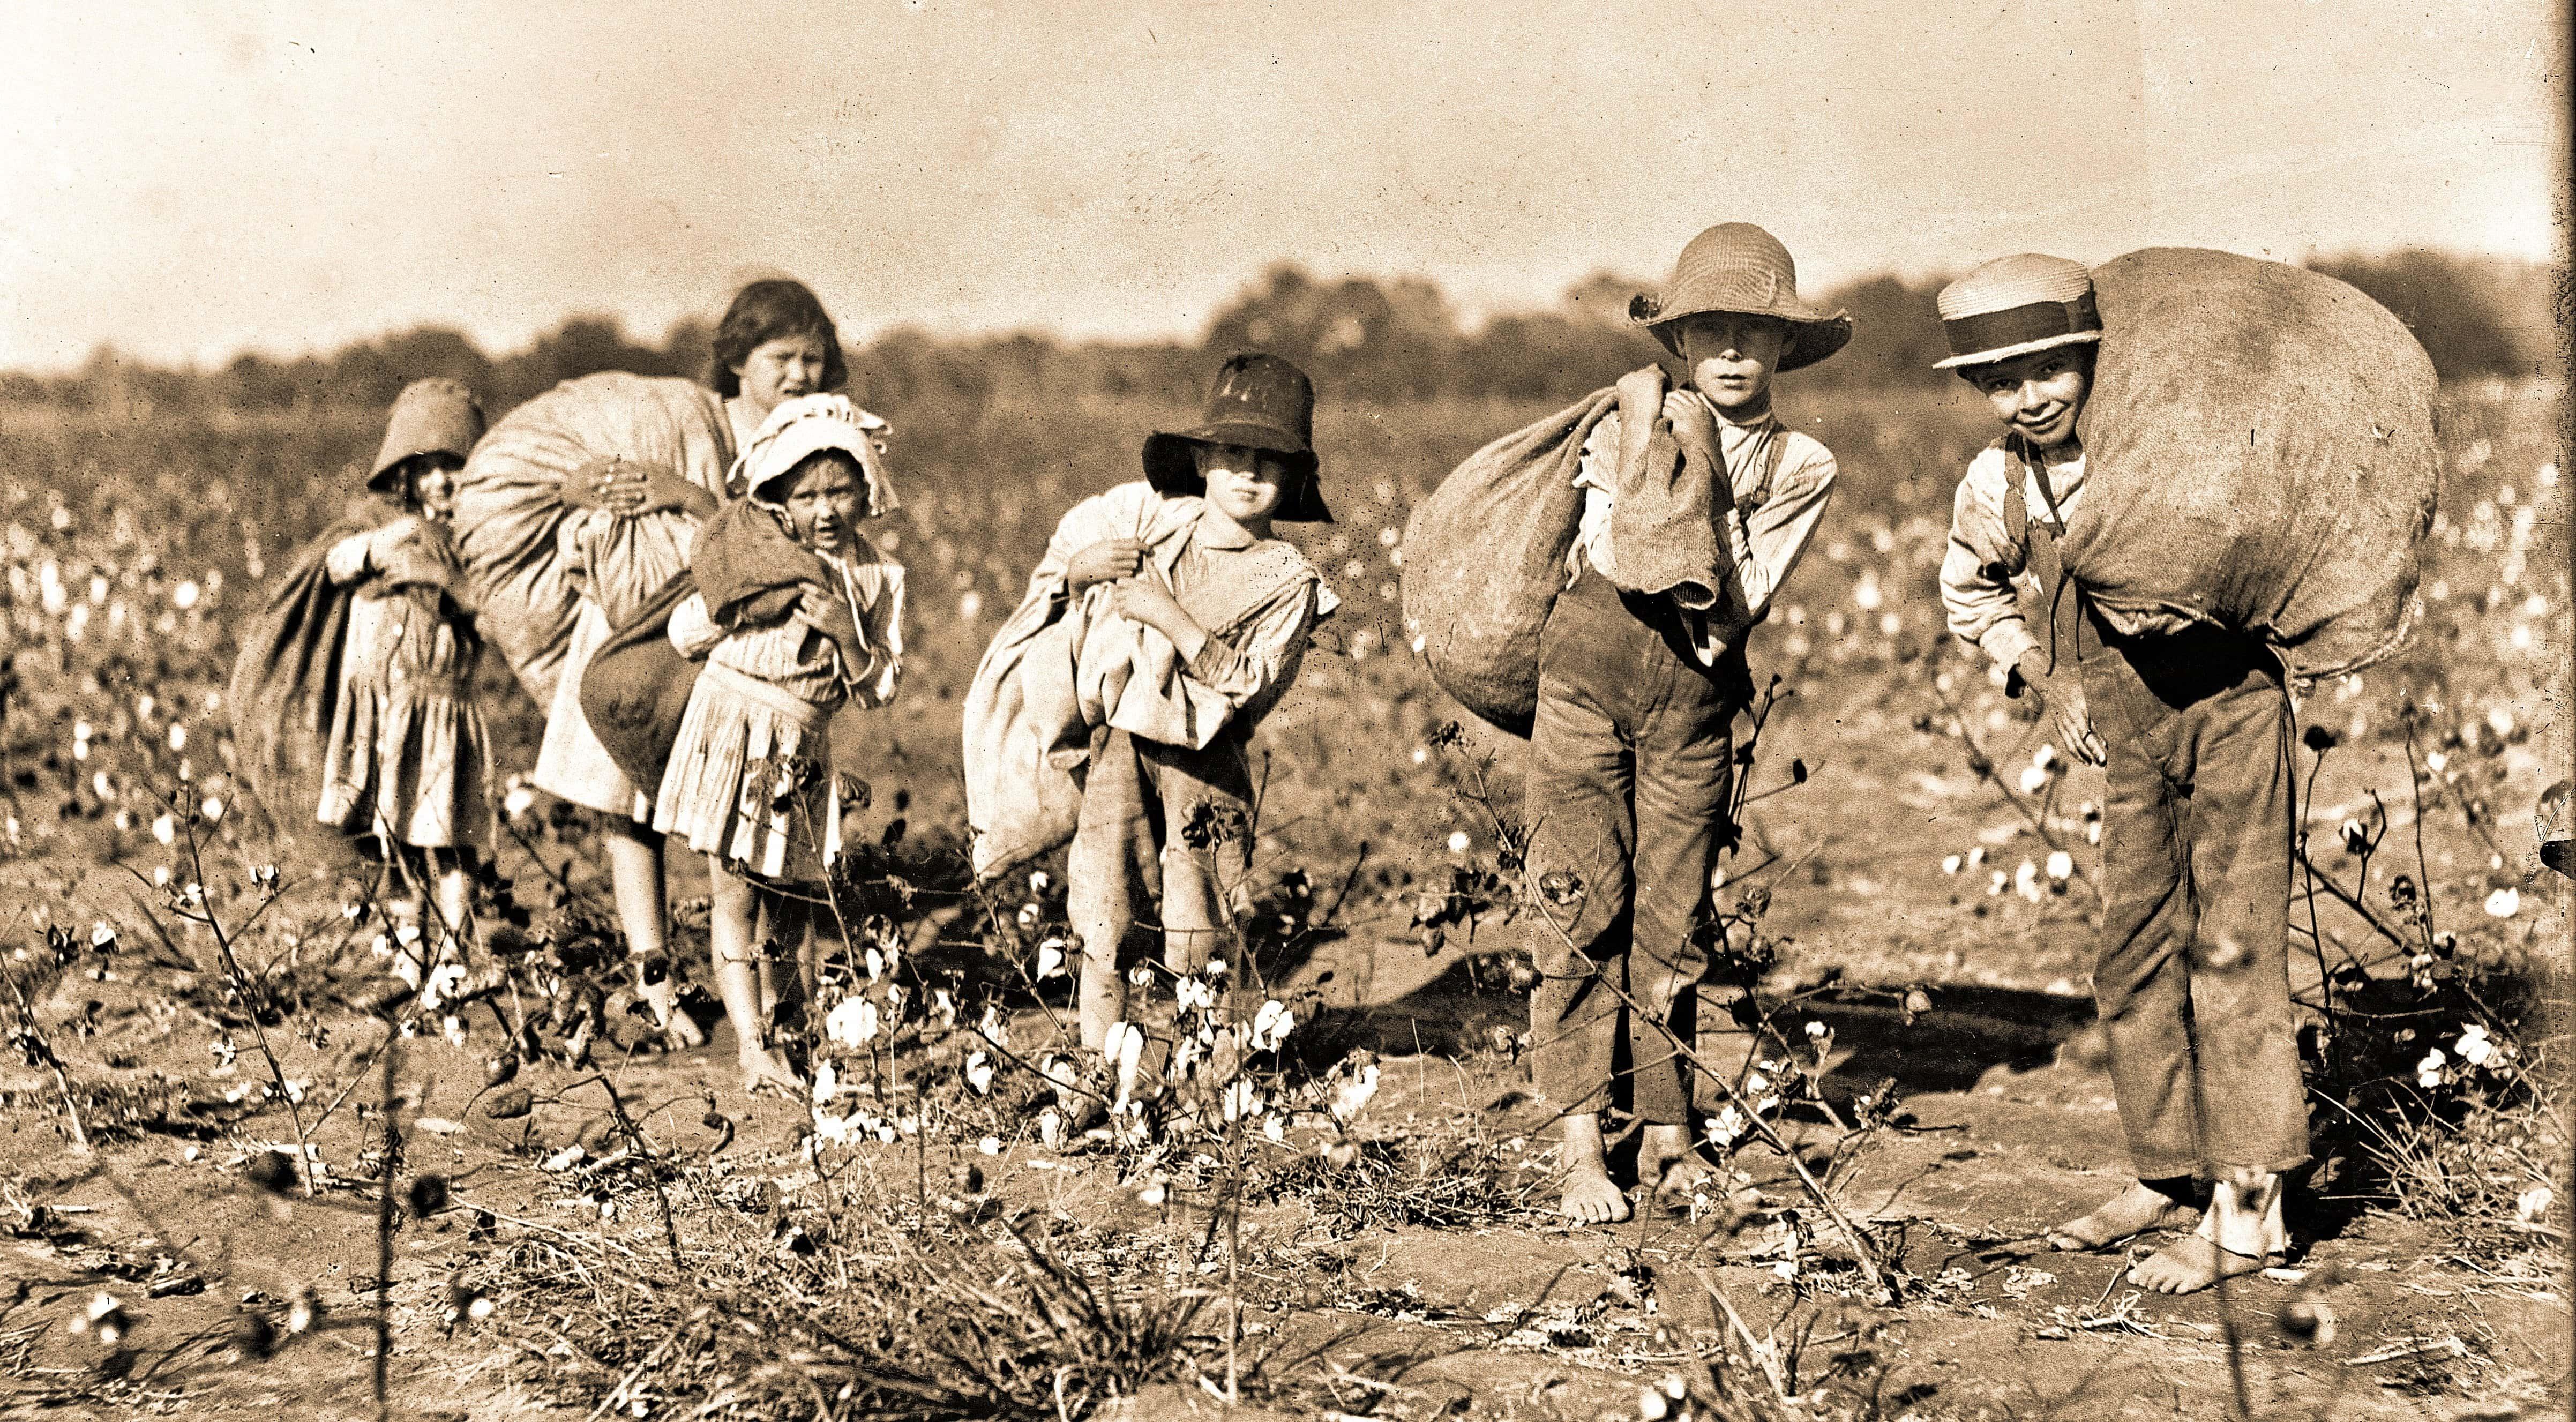 Children-Picking-Cotton-United-States